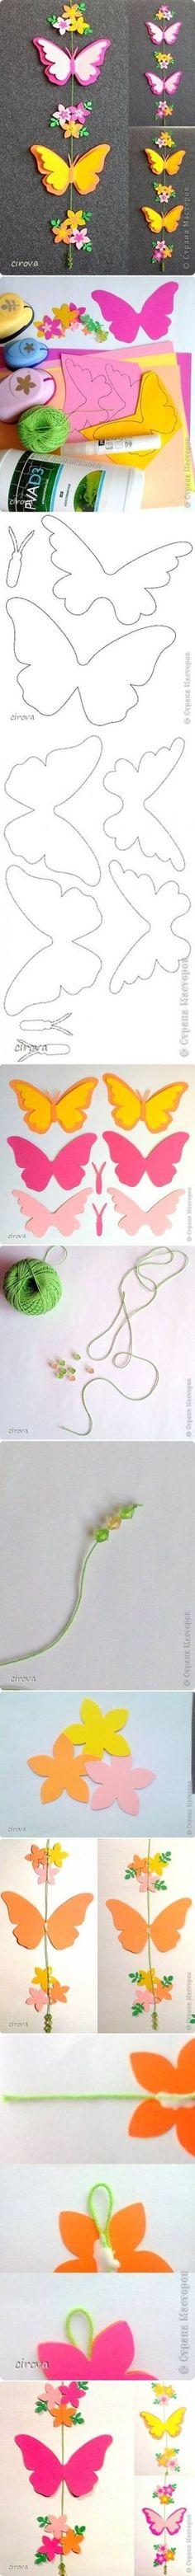 DIY de la mariposa del Papel Móvil DIY Paper Butterfly Mobile.: